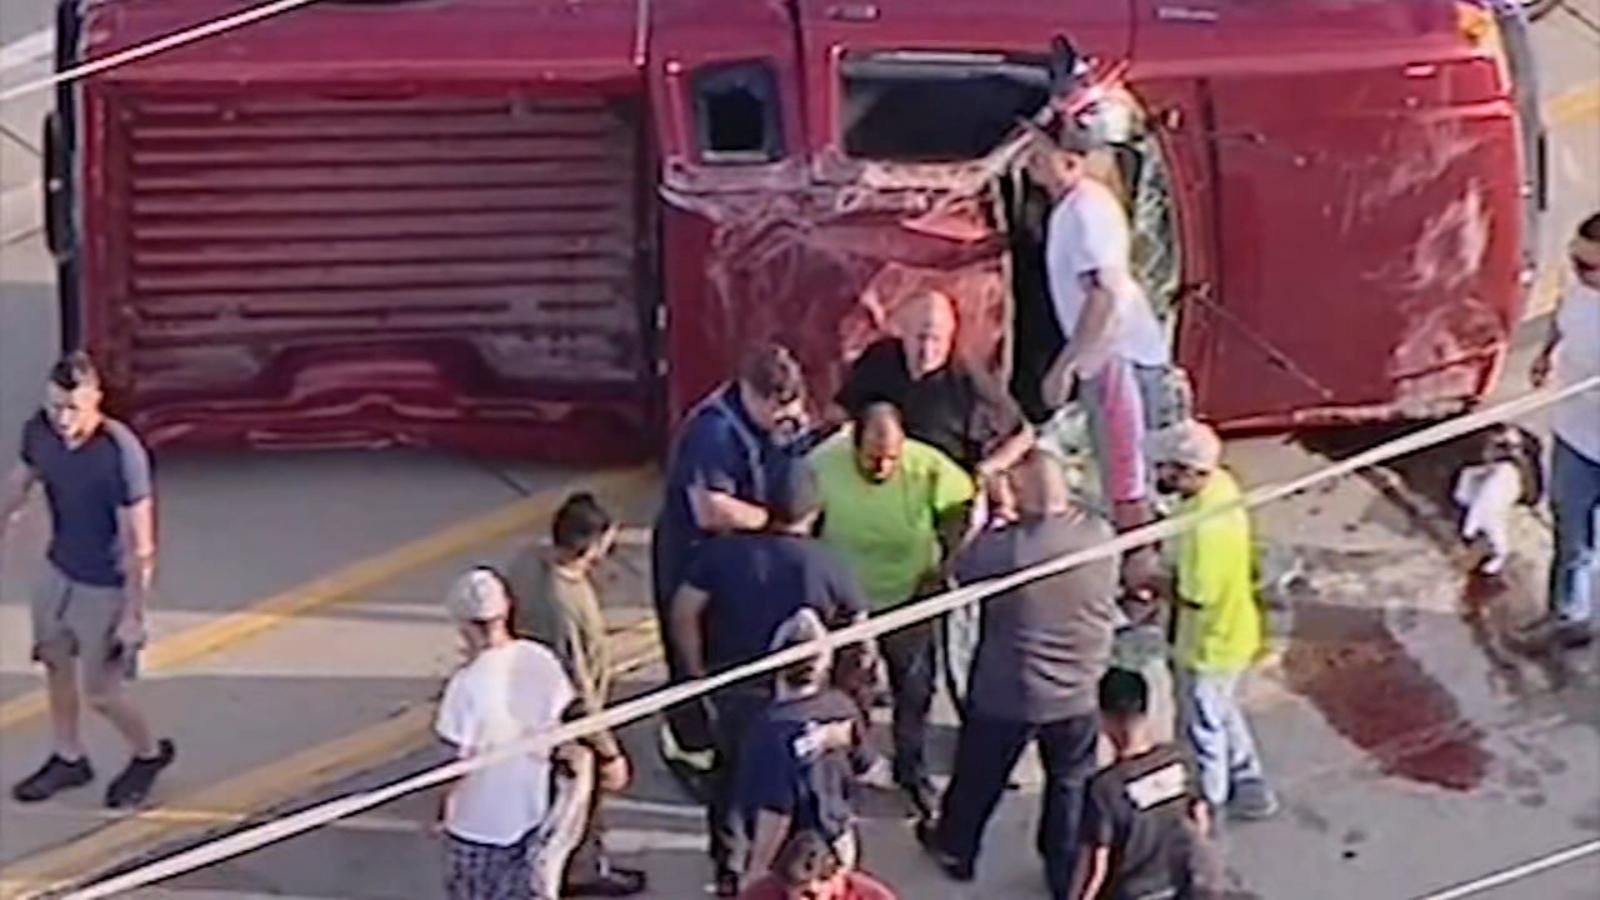 VIDEO: Good Samaritans rescue driver of overturned pickup truck on I-88